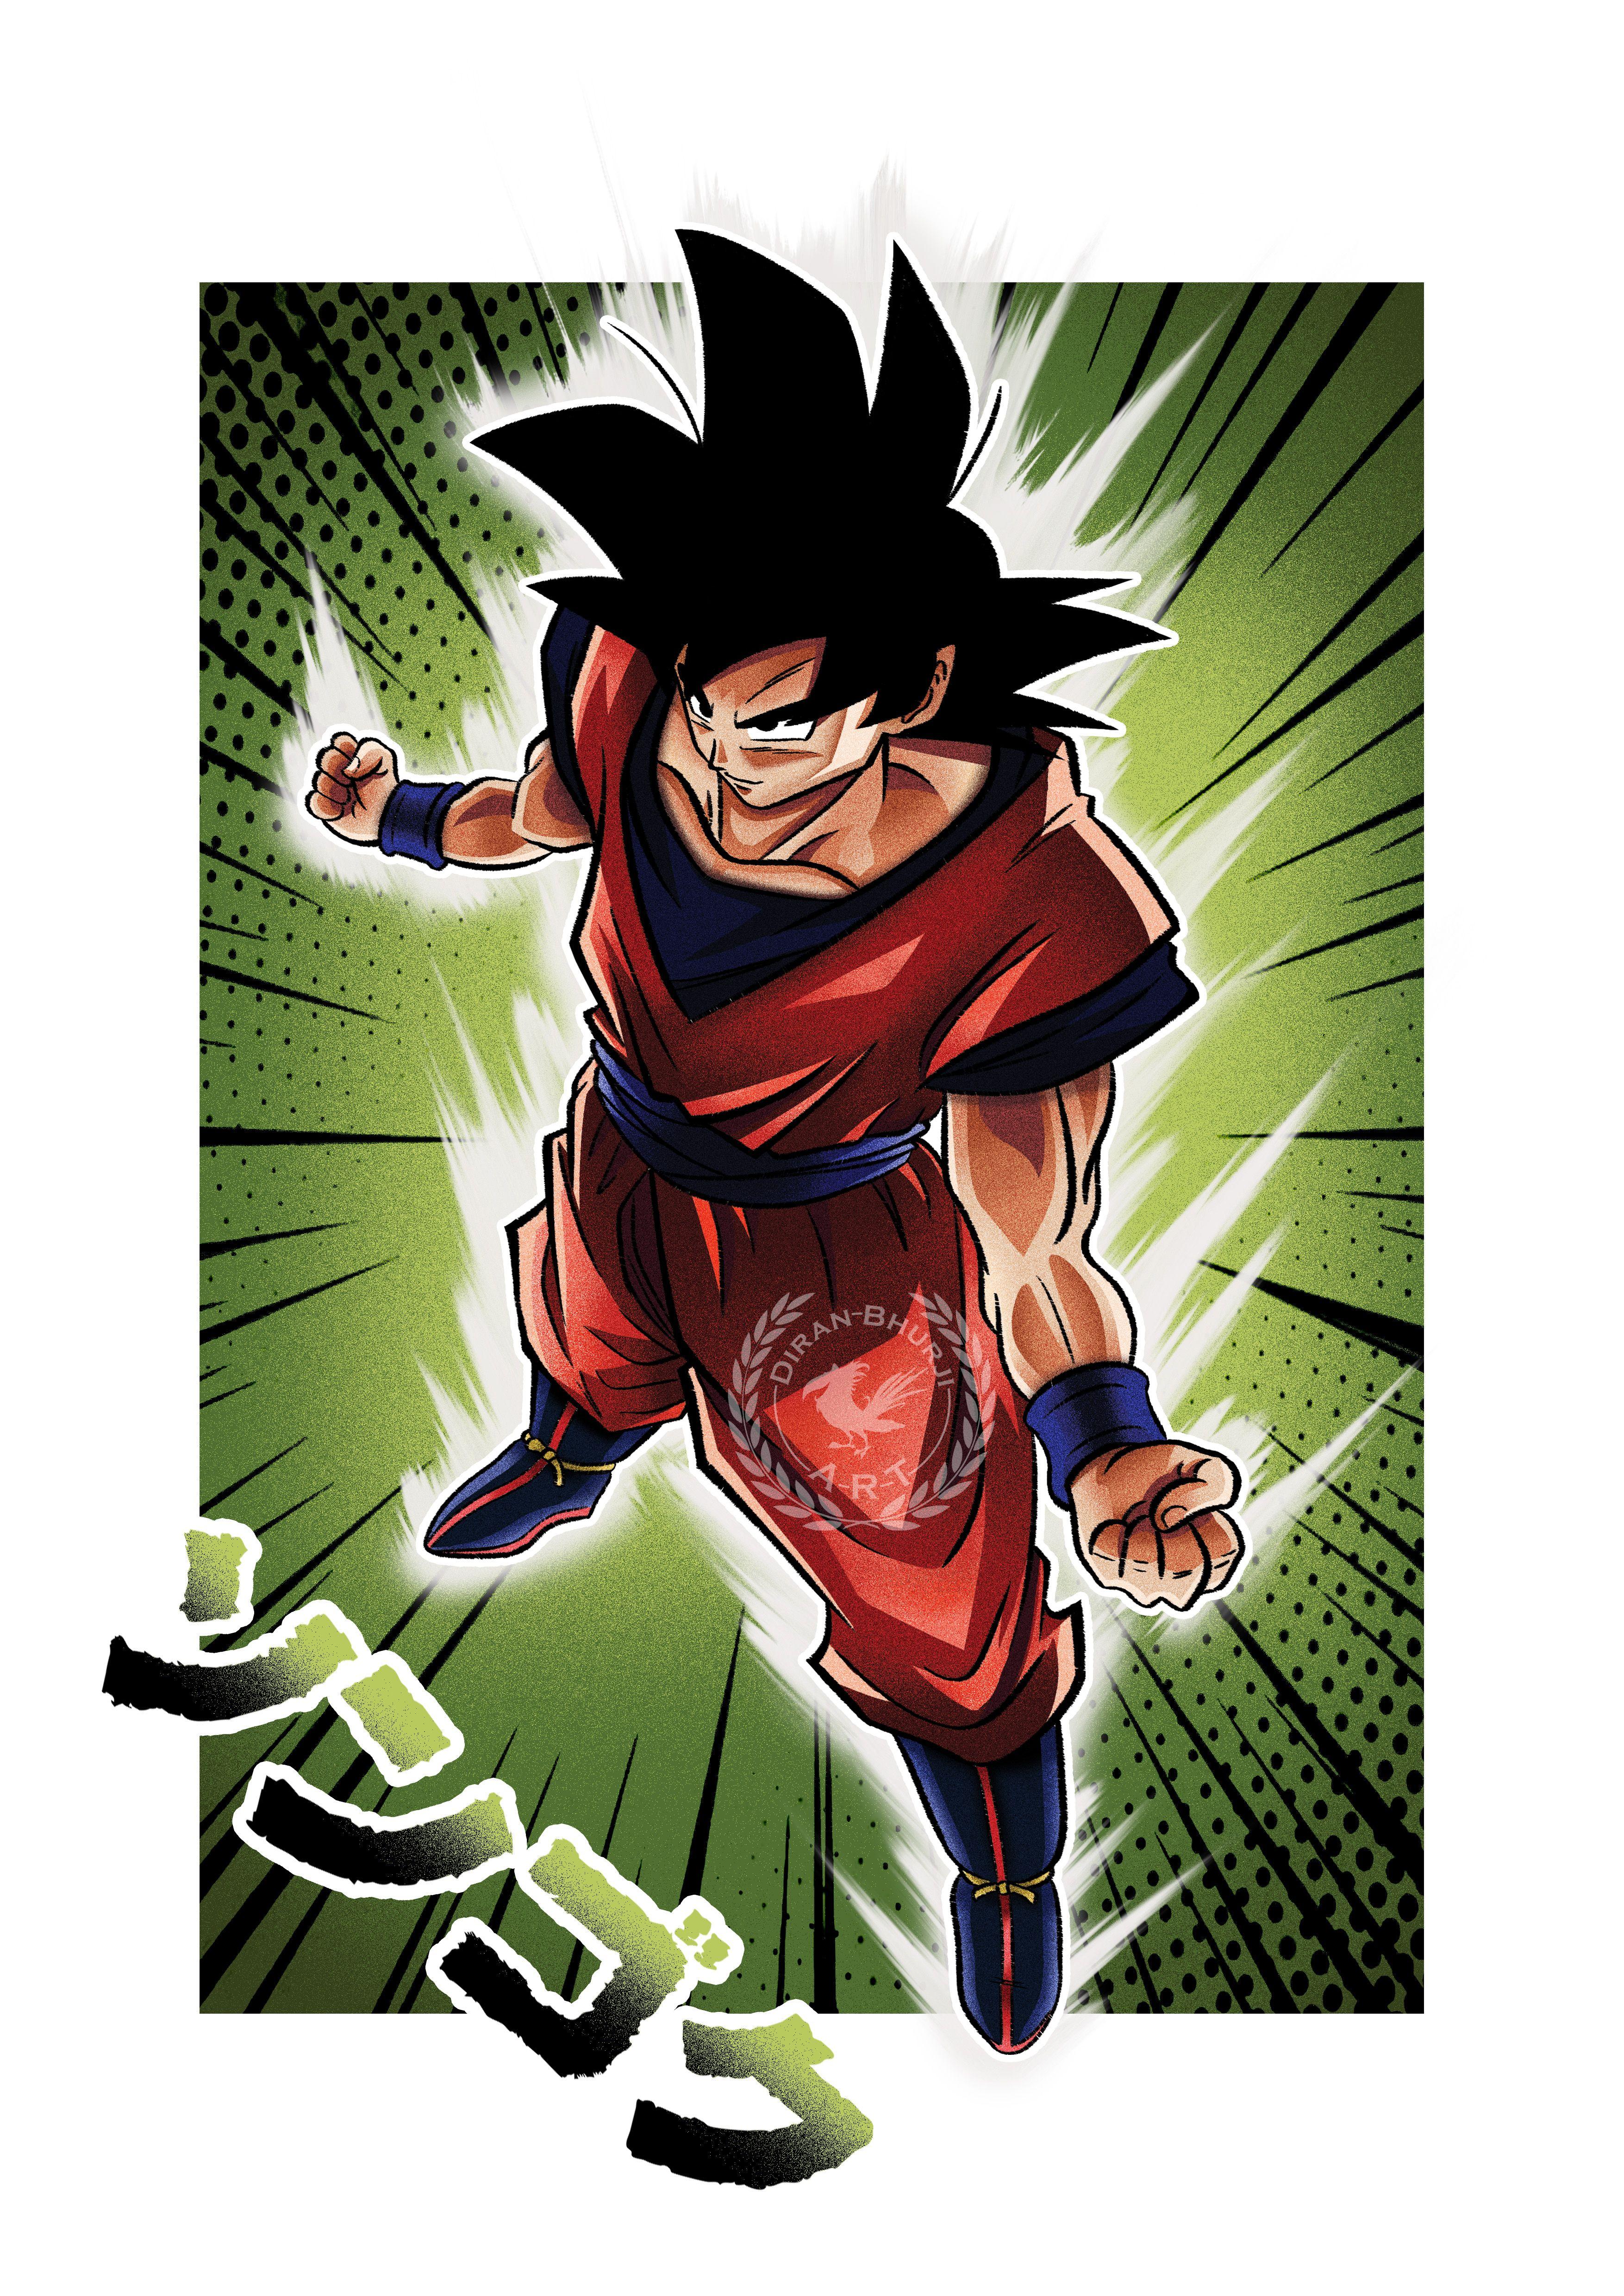 Dbz Dragonball Z Goku Base Form Anime Manga Illustration Animation Art Instagram Anime Dragon Ball Super Dragon Ball Super Manga Dragon Ball